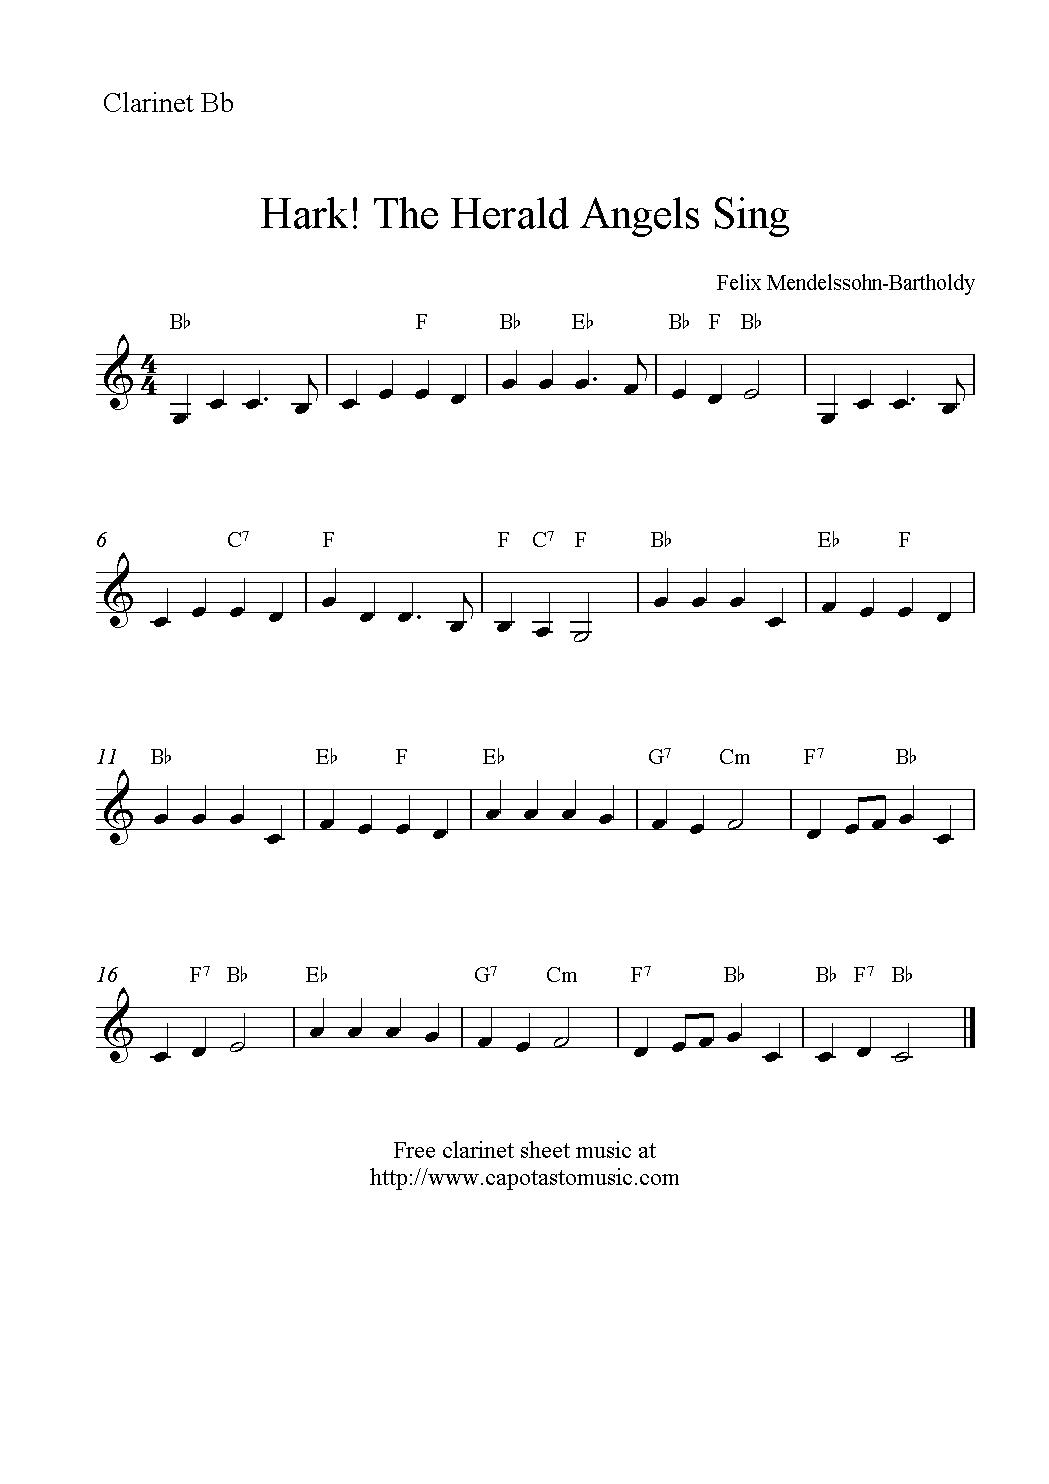 Christmas Clarinet Sheet Music Free - Google Search | Music - Free Printable Clarinet Music